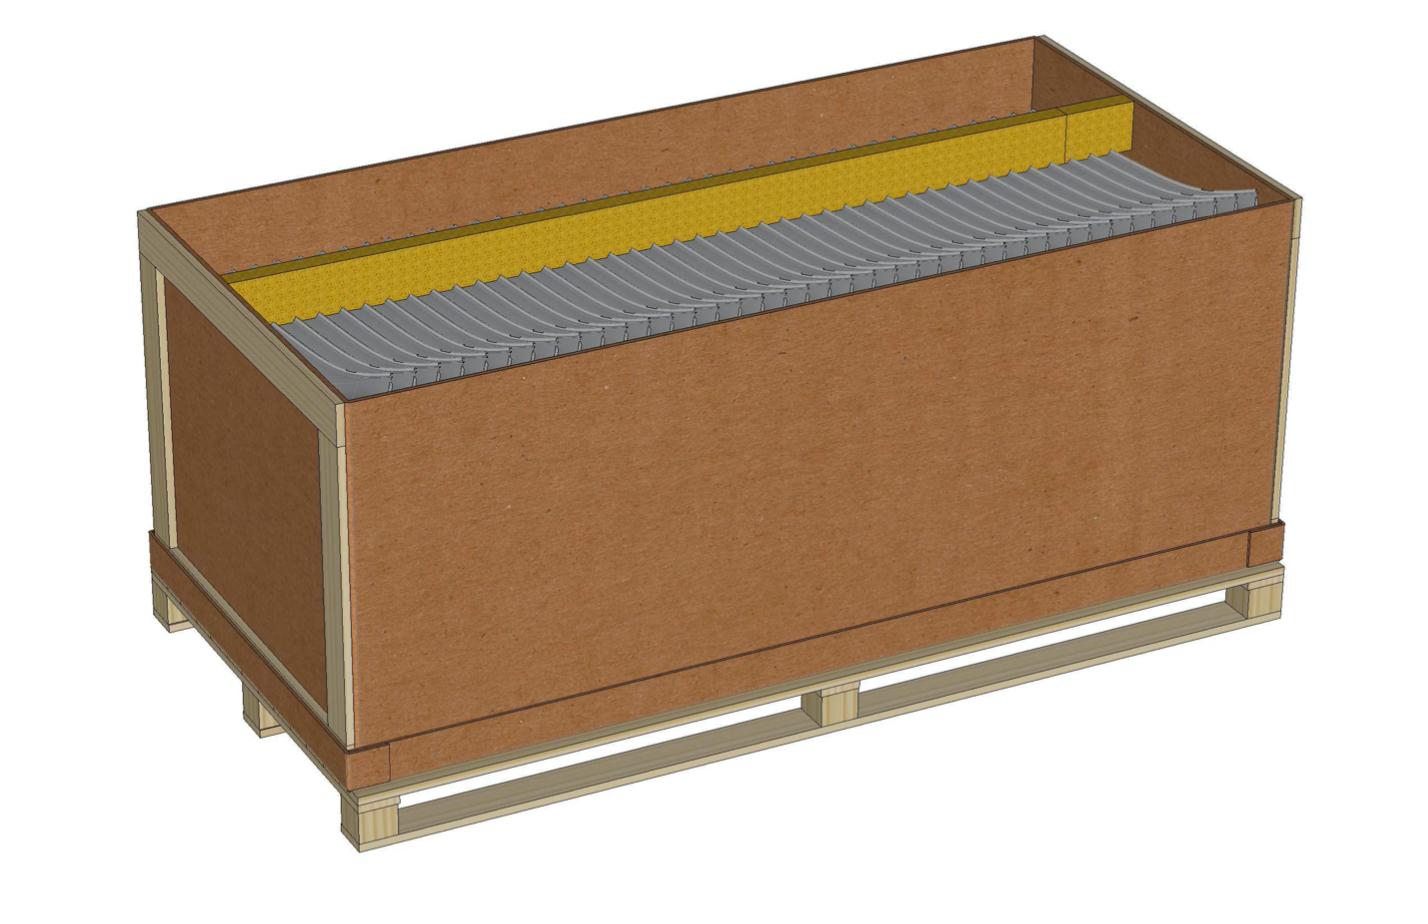 cajas de embalaje diseño 5